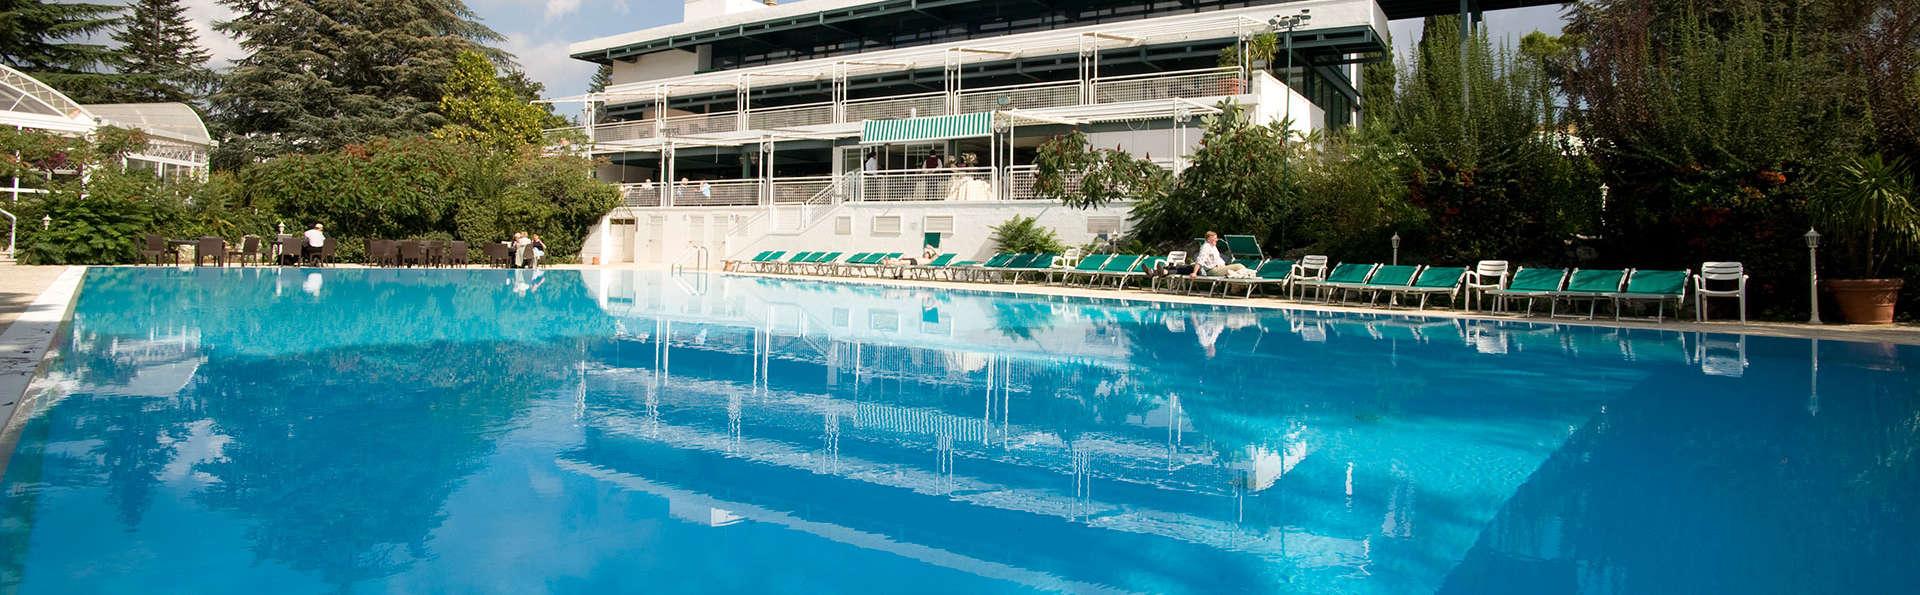 Hotel Sierra Silvana - EDIT_front.jpg